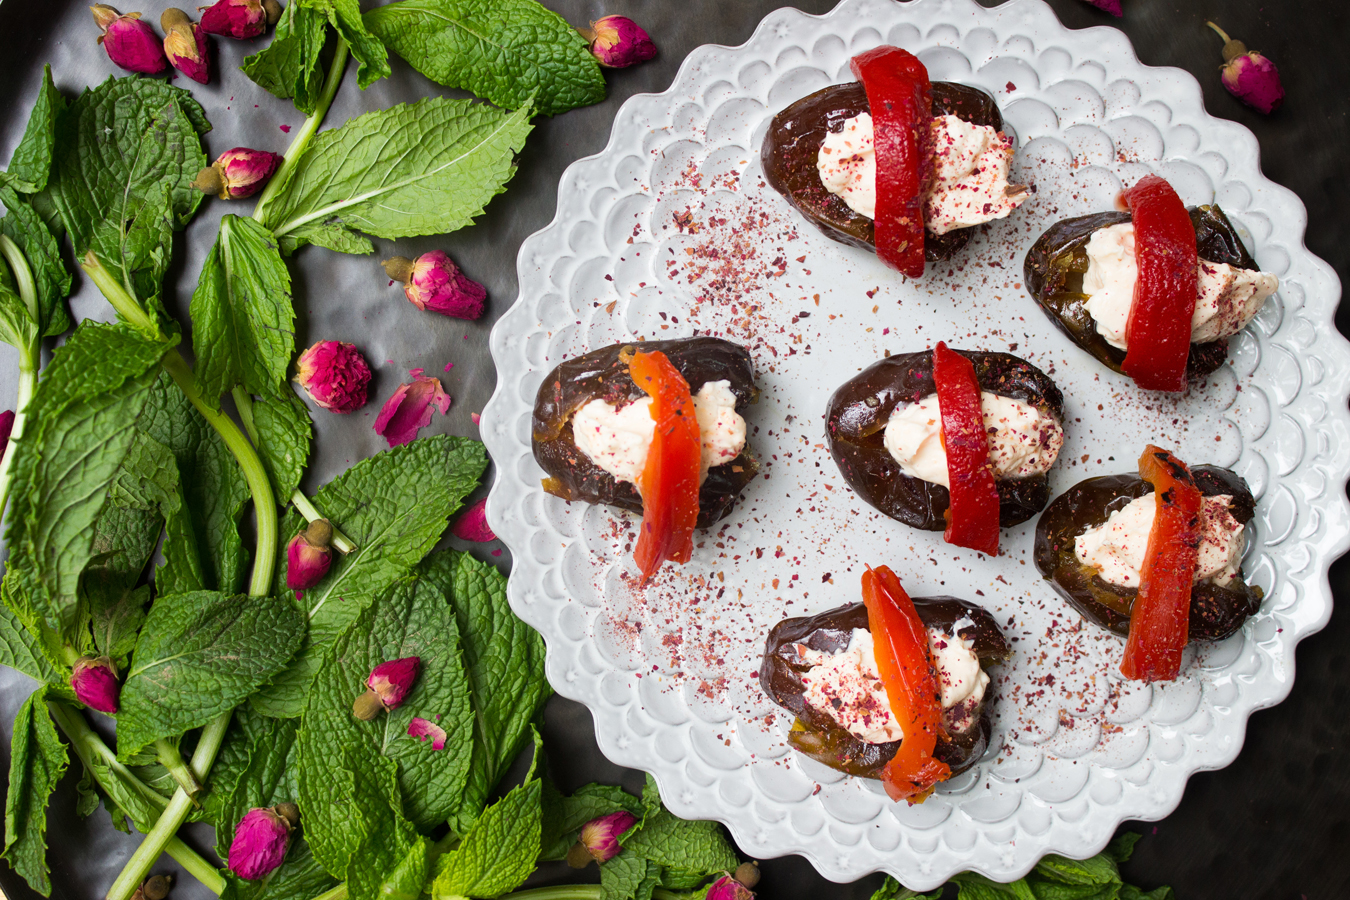 Make | Naz Deravian's Harissa Yogurt Stuffed Dates